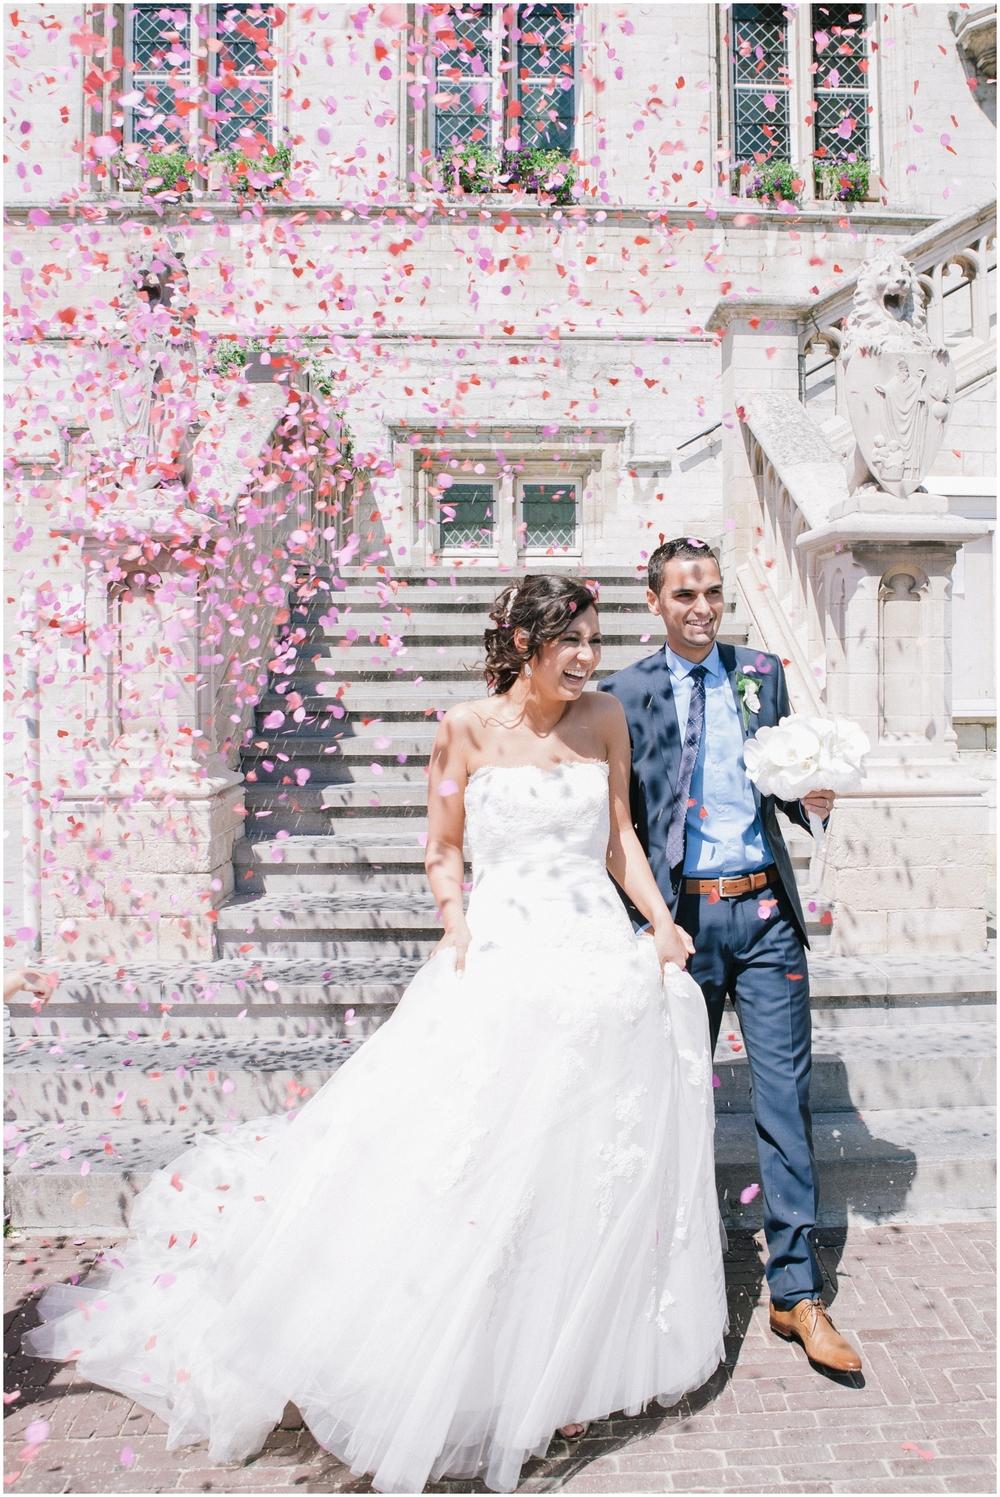 Huwelijk stadhuis Sint-Niklaas